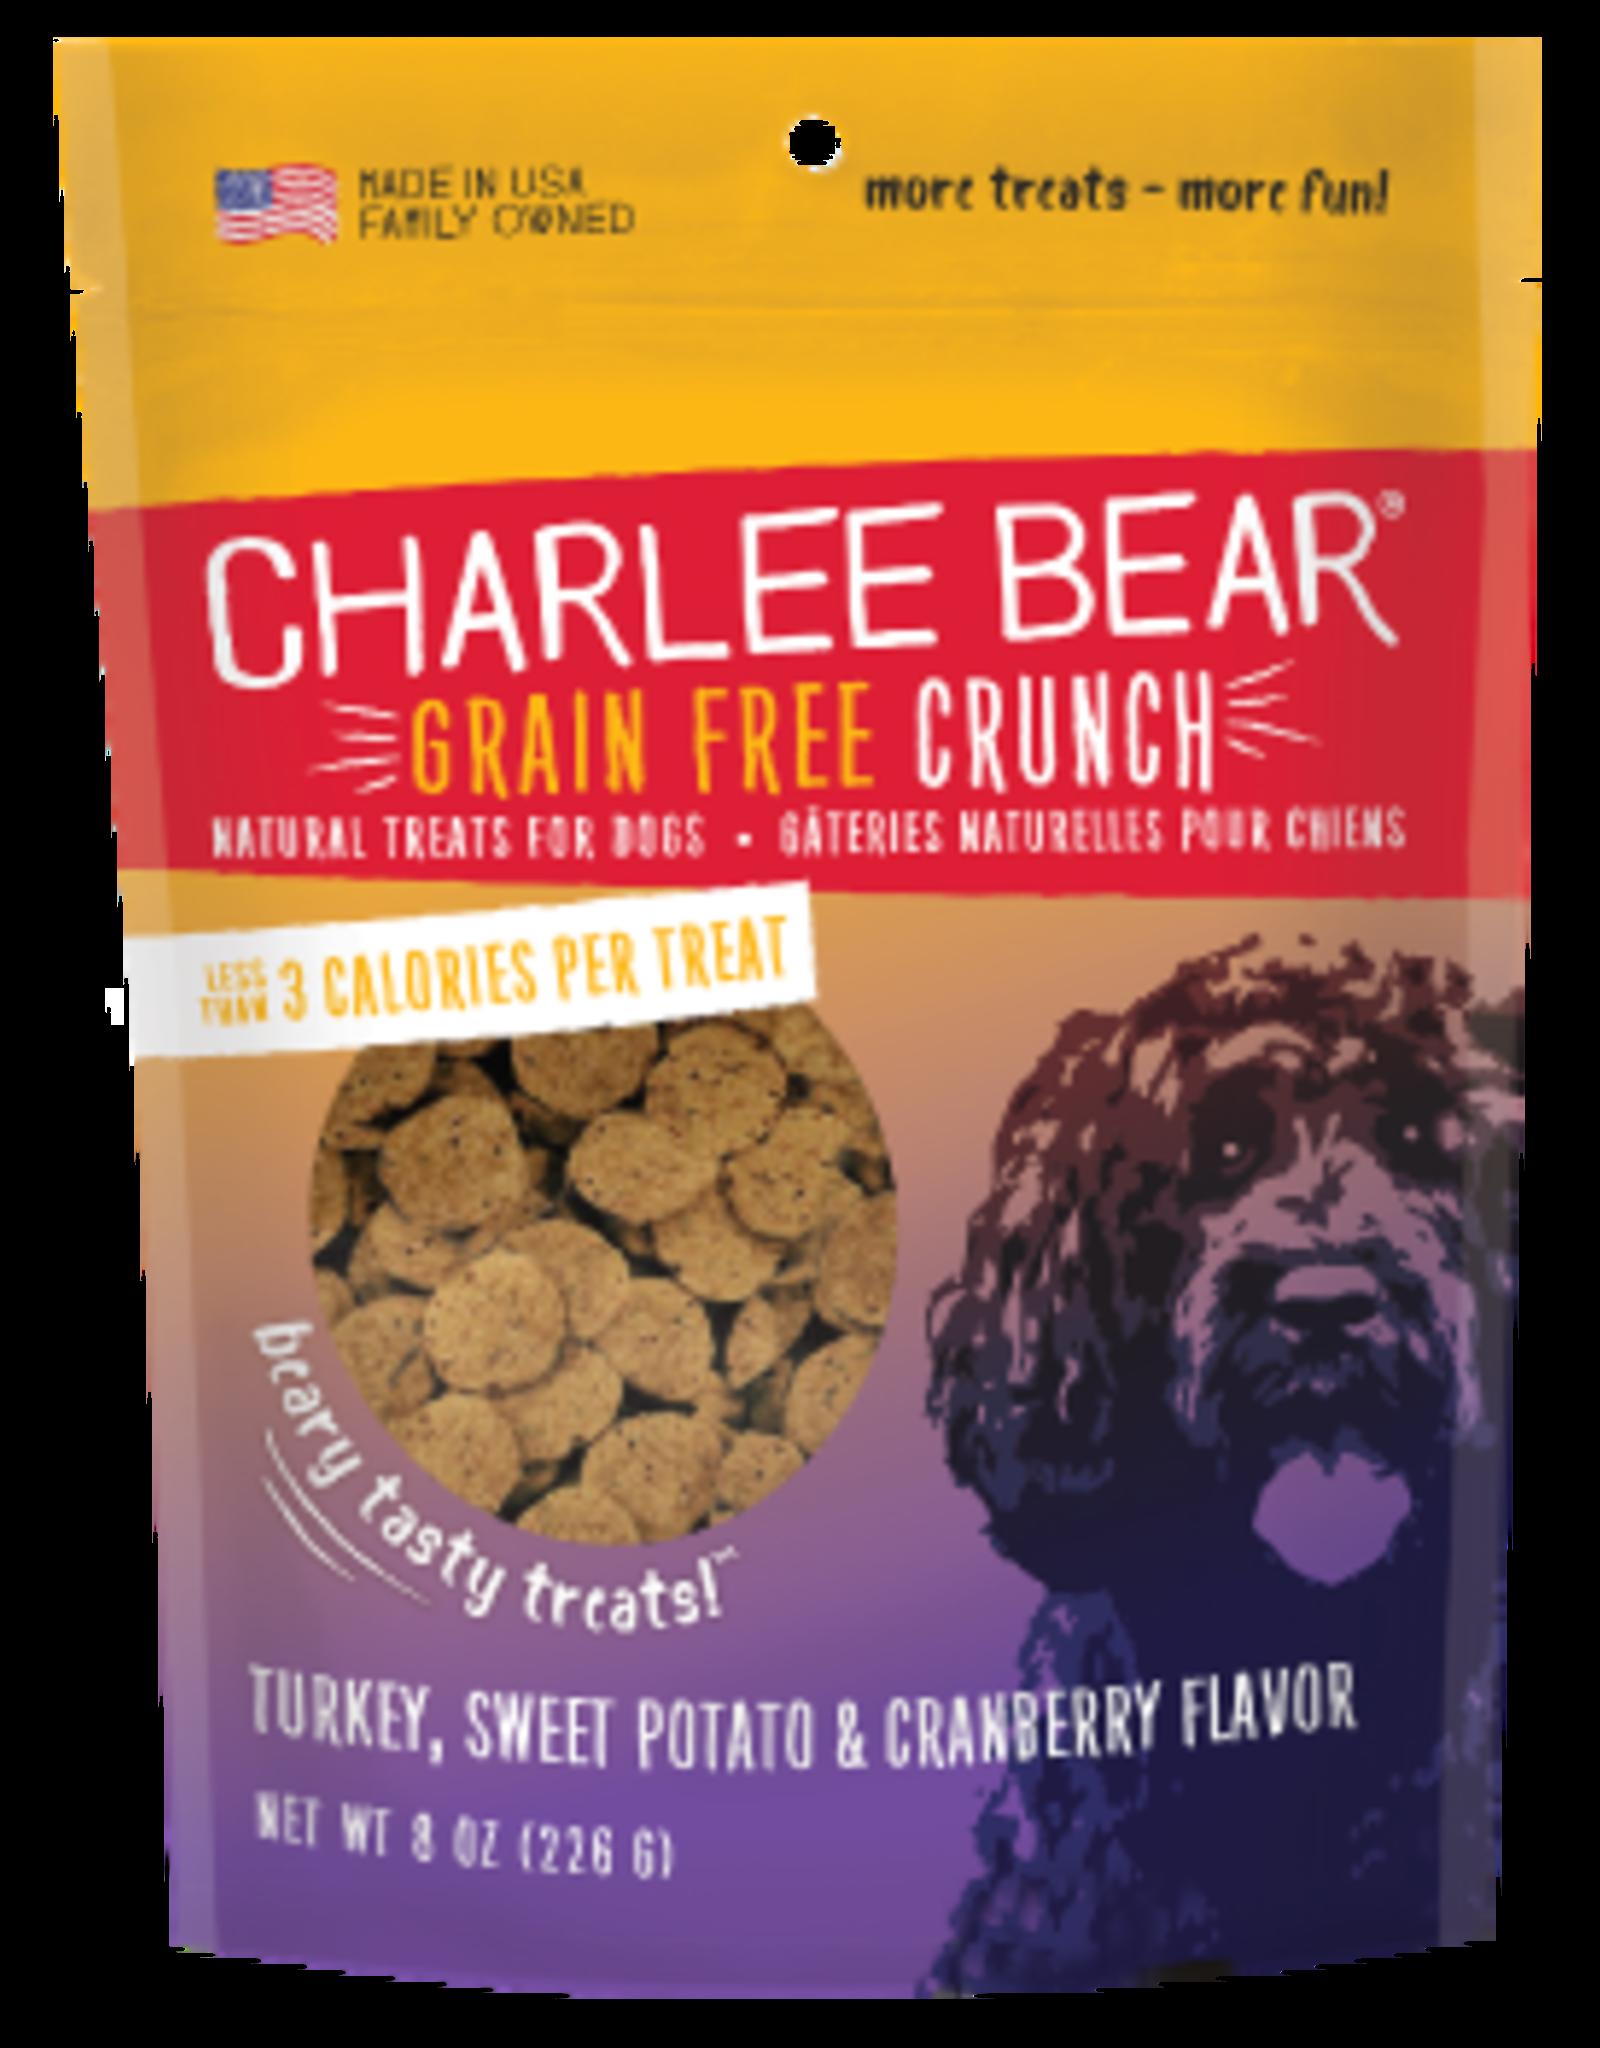 Charlee Bear Grain Free Turkey, Sweet Potato & Cranberry Flavor